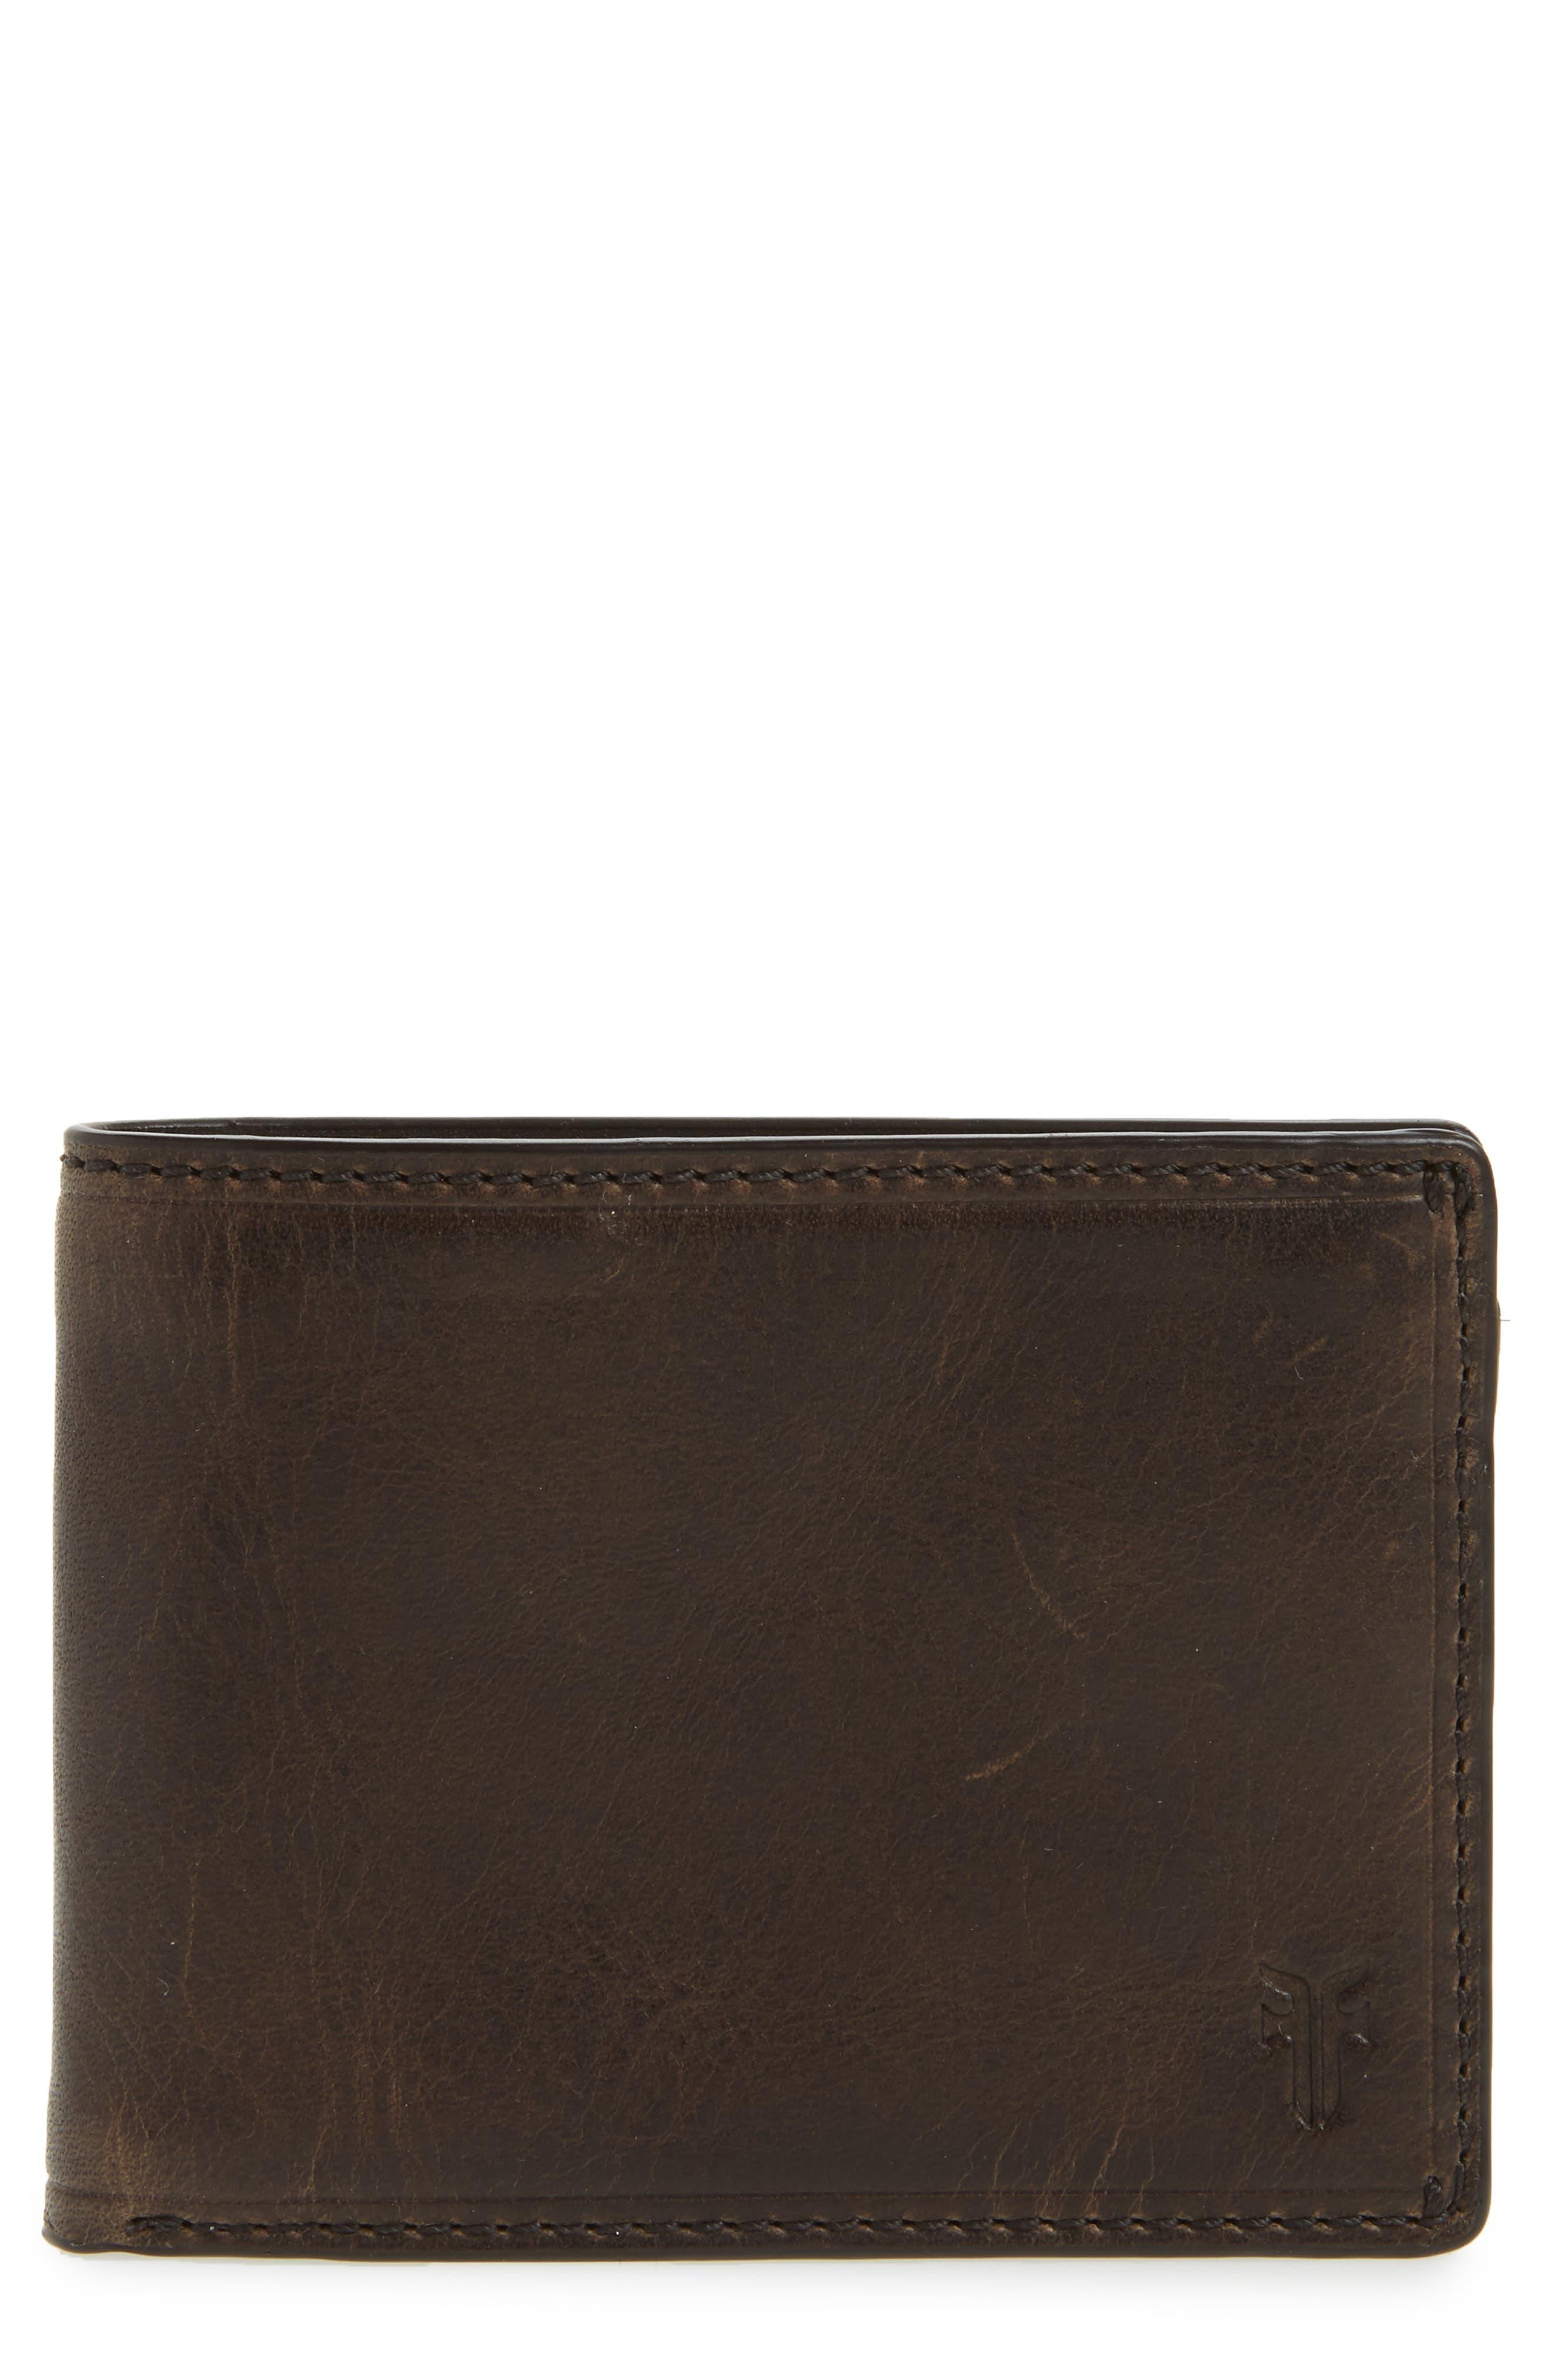 Logan Leather Wallet,                             Main thumbnail 1, color,                             Slate